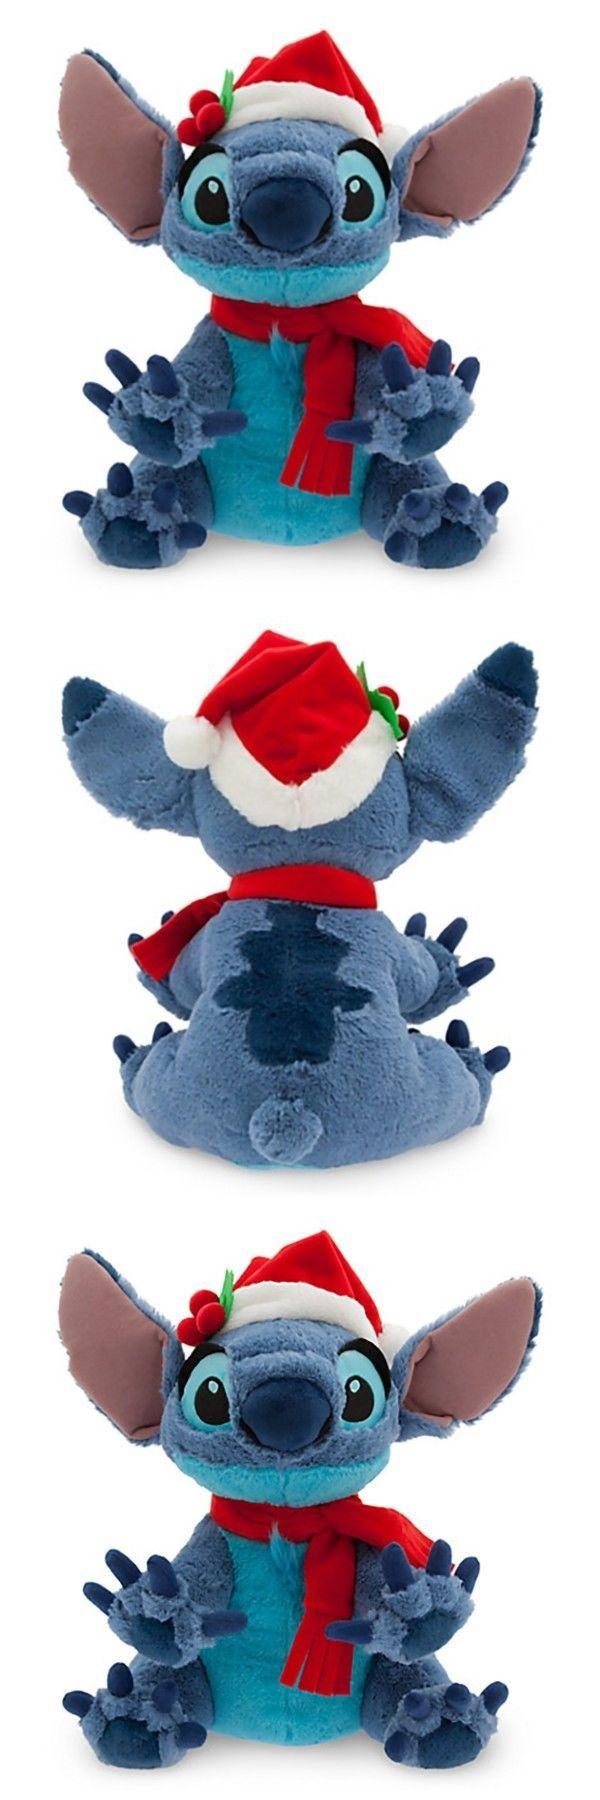 Lilo and Stitch 44035: Disney Store Santa Stitch Medium Stuffed Animal Alien Doll Kids Toy Lilo Hawaii -> BUY IT NOW ONLY: $30.64 on eBay!